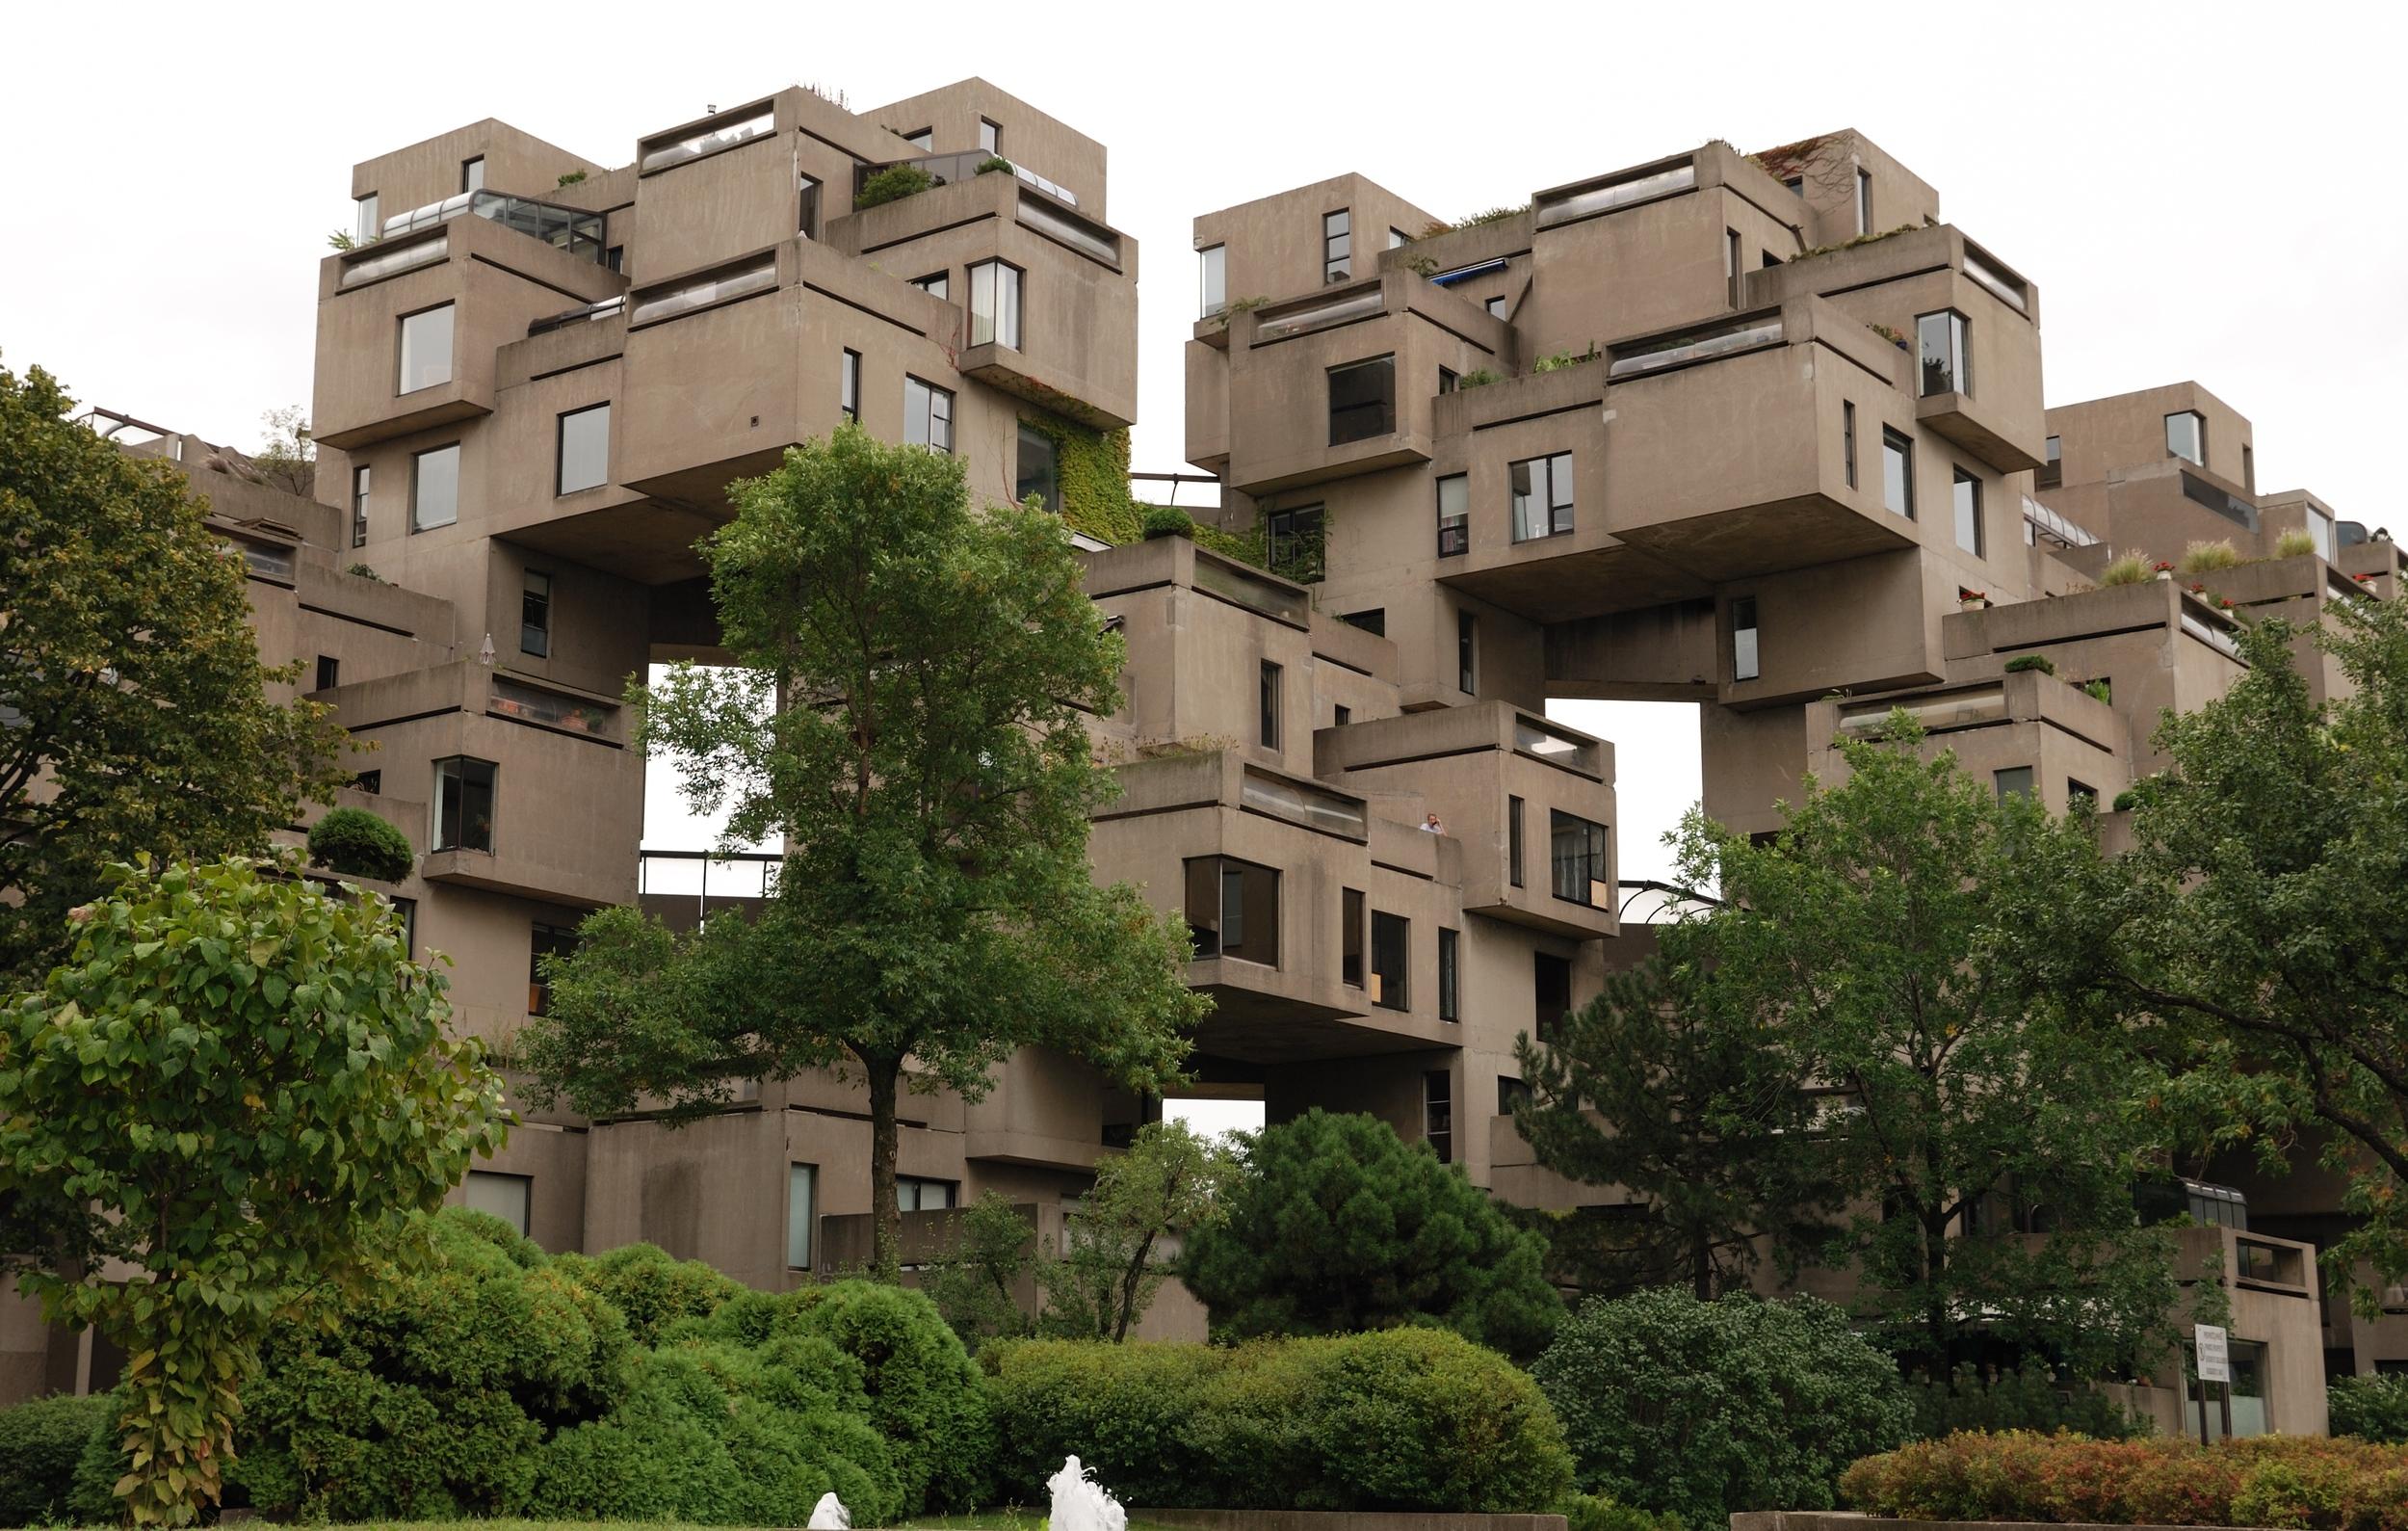 Moshe Safdie's Habitat 67 project for the World's Fair in 1967.